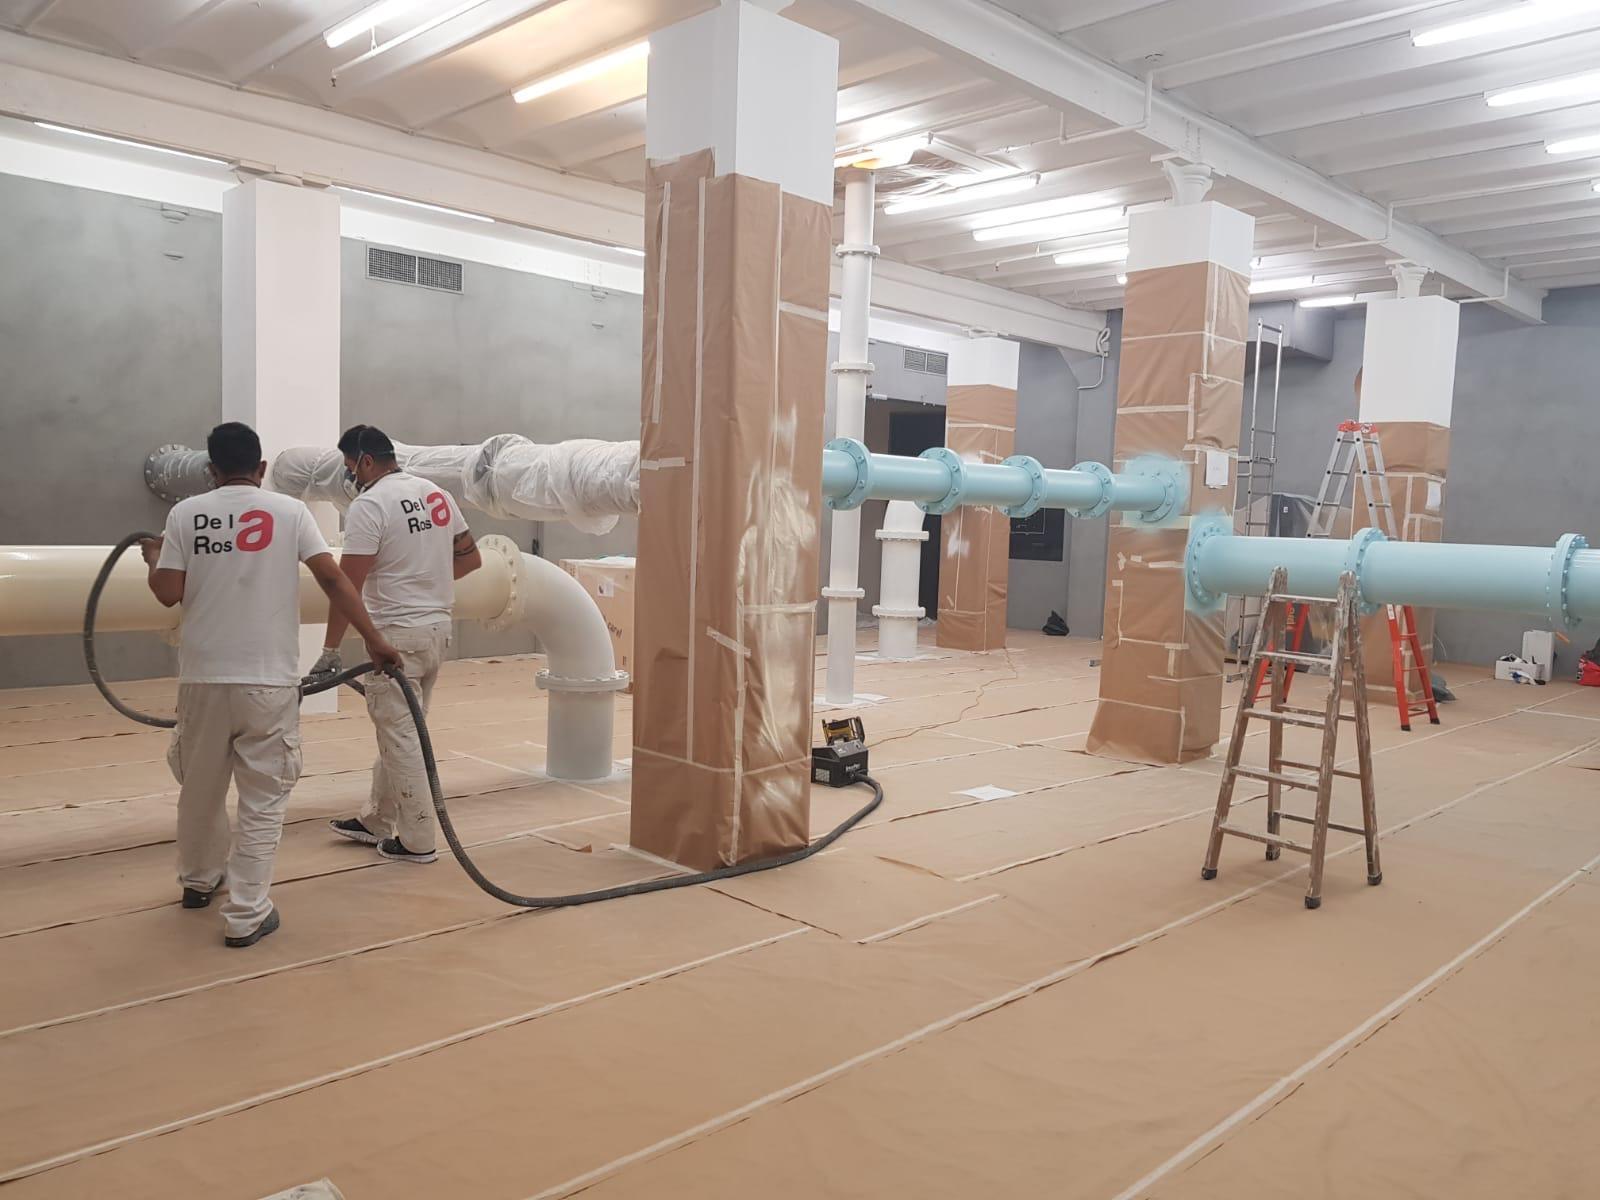 pintores de fábricas